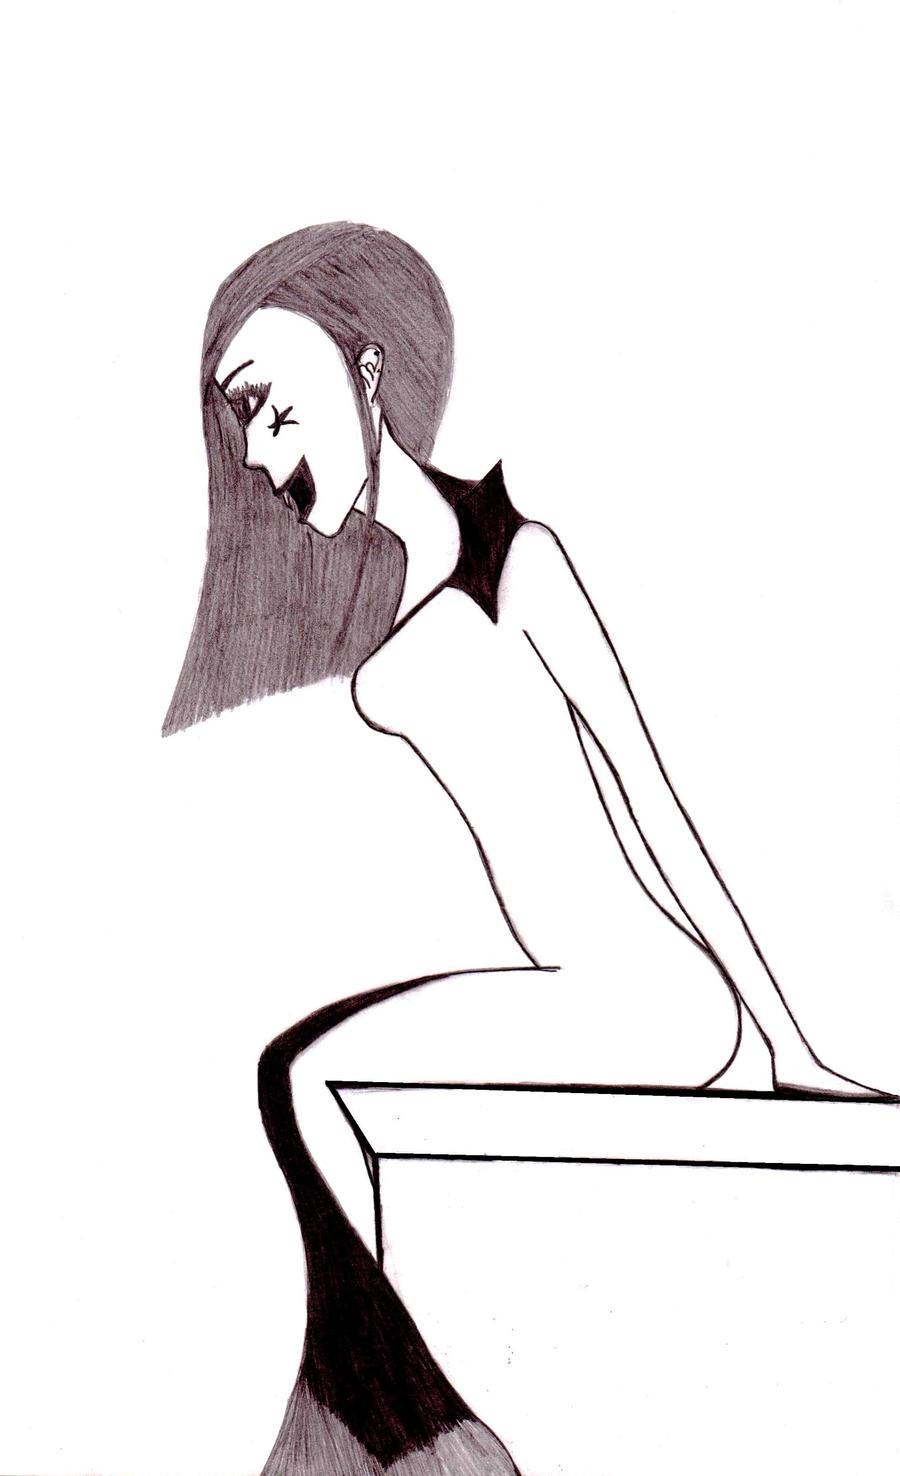 ObsidianVelvet's Profile Picture